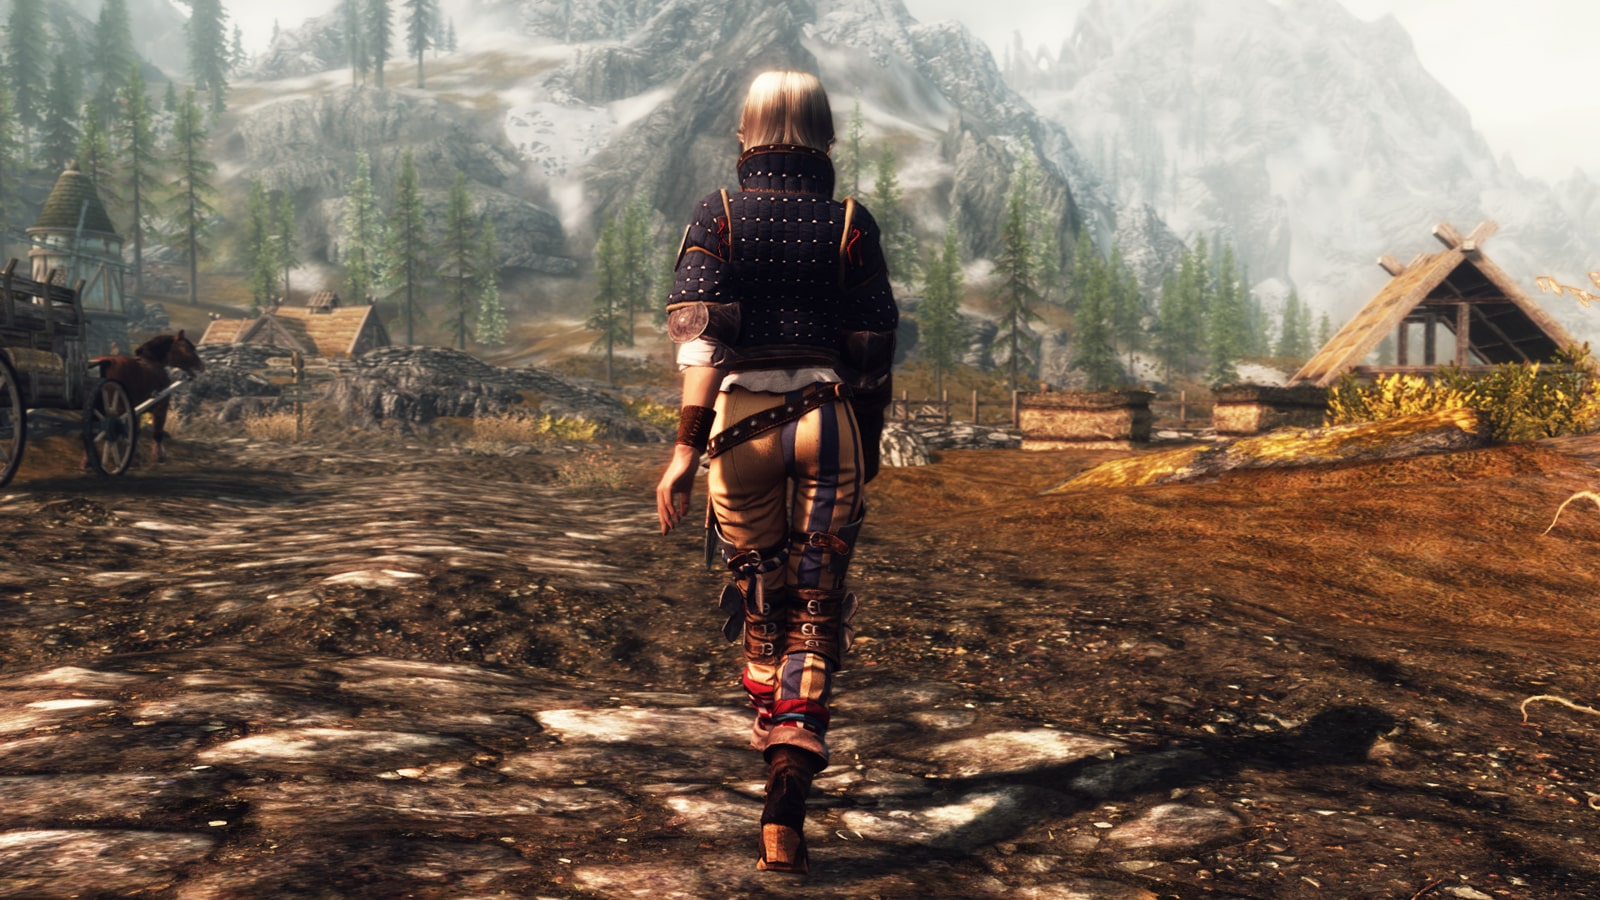 Witcher 2 - Viper Assassin-Blue Stripes-Roche-Ves | Броня из Ведьмака 2